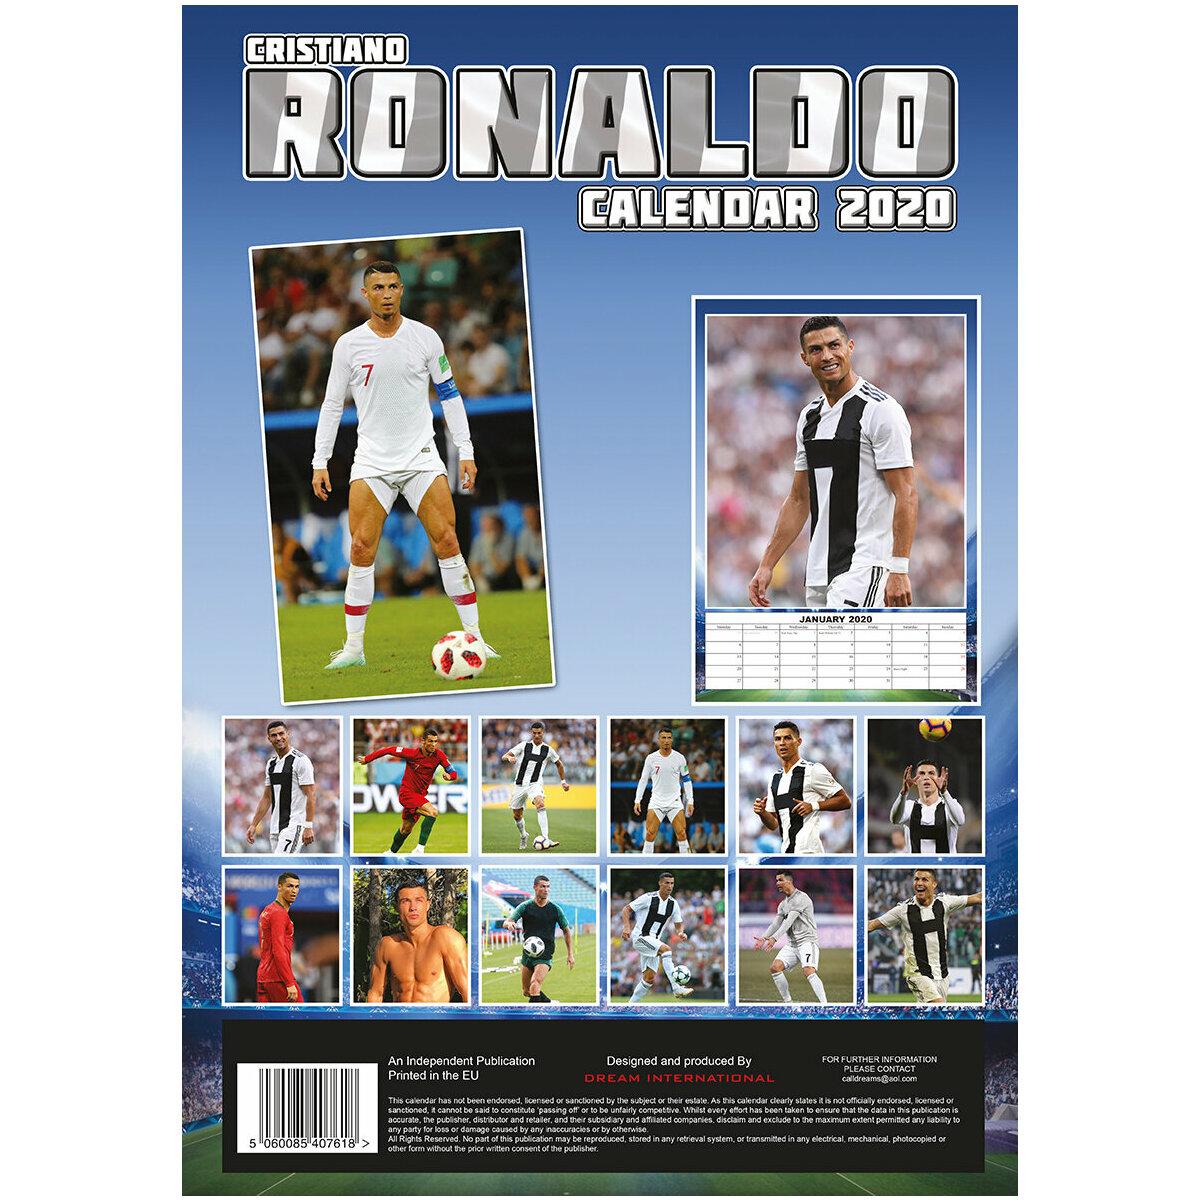 Calendrier De Lavent Football.Calendrier 2020 Cristiano Ronaldo Format A3